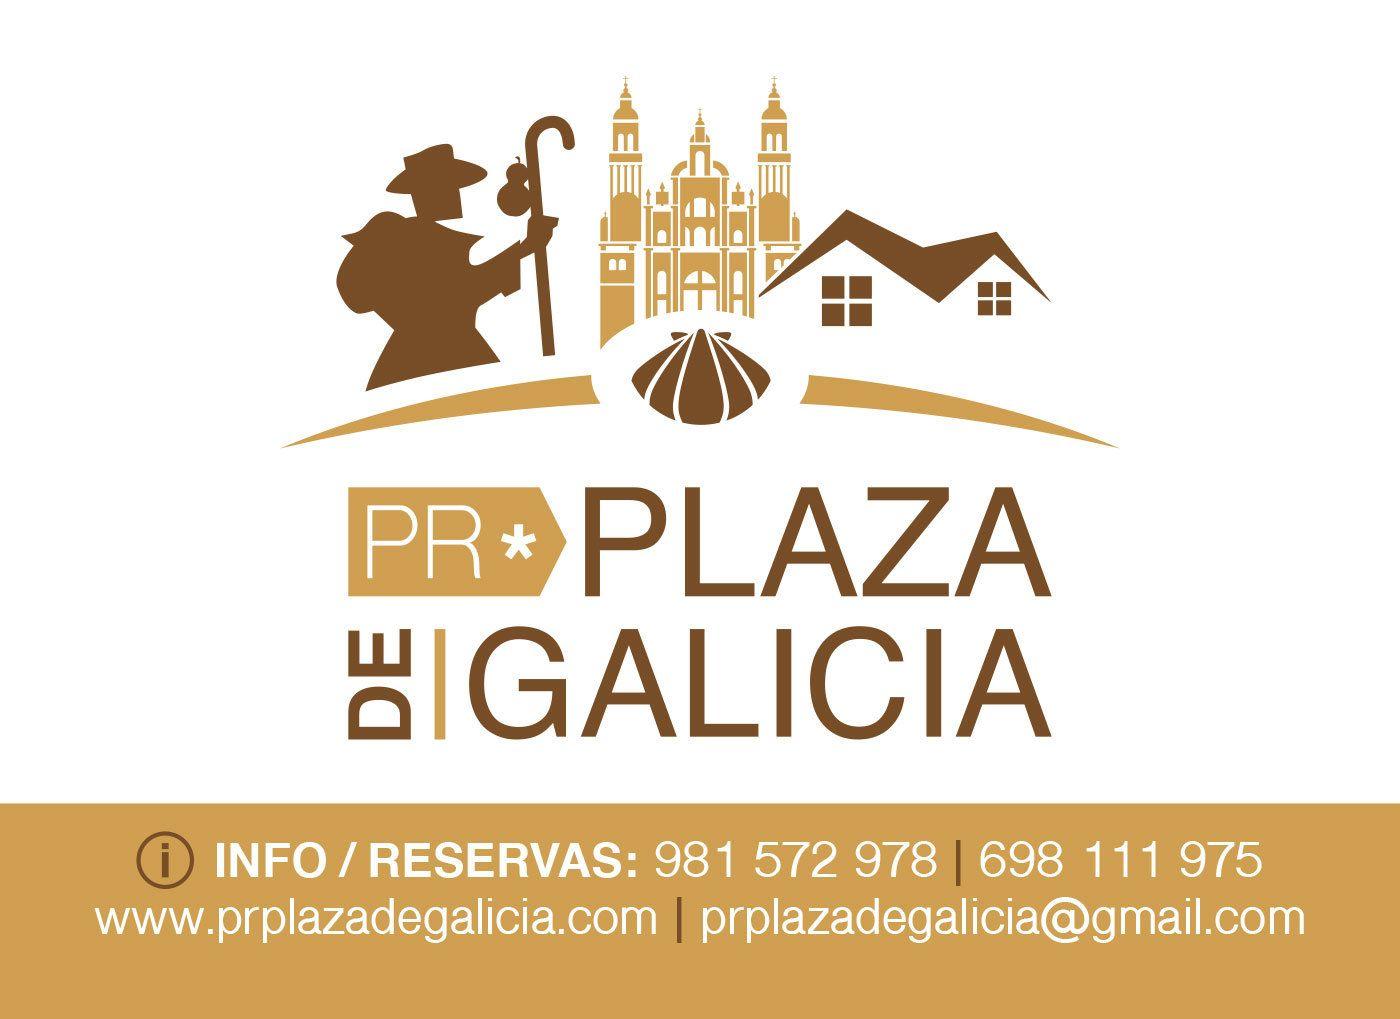 PR加利西亚广场酒店